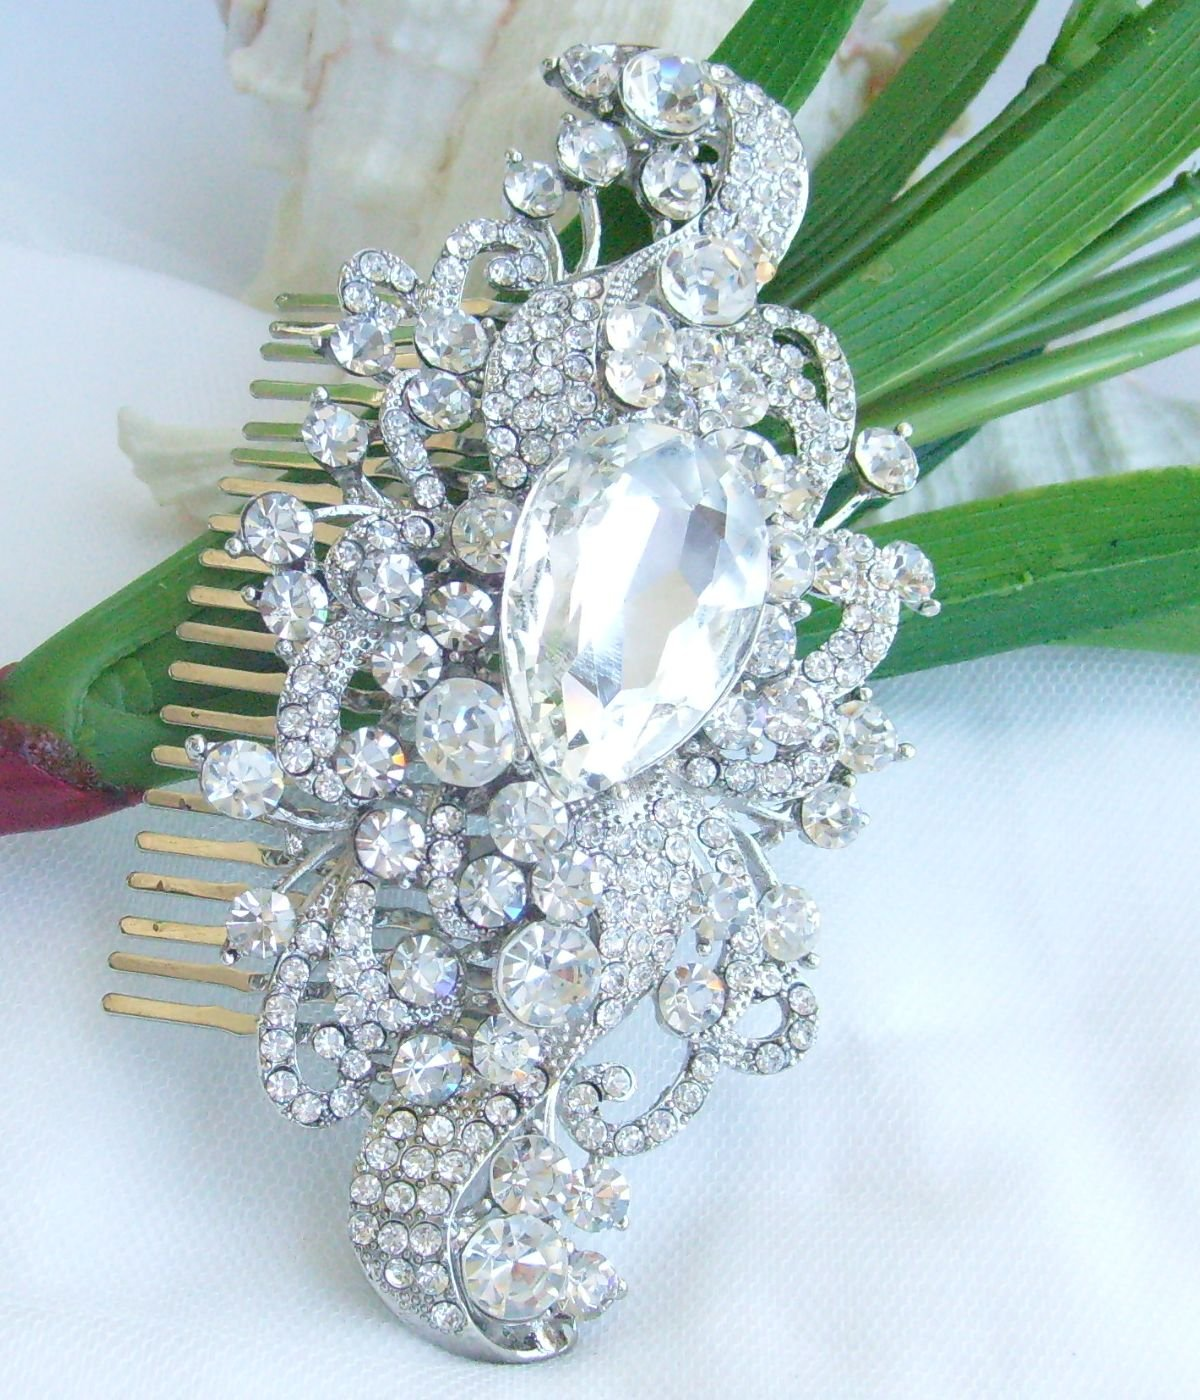 Sindary Wedding Headpiece 4.53 Inch Silver-tone Clear Rhinestone Crystal Flower Hair Comb by Sindary Jewelry (Image #4)